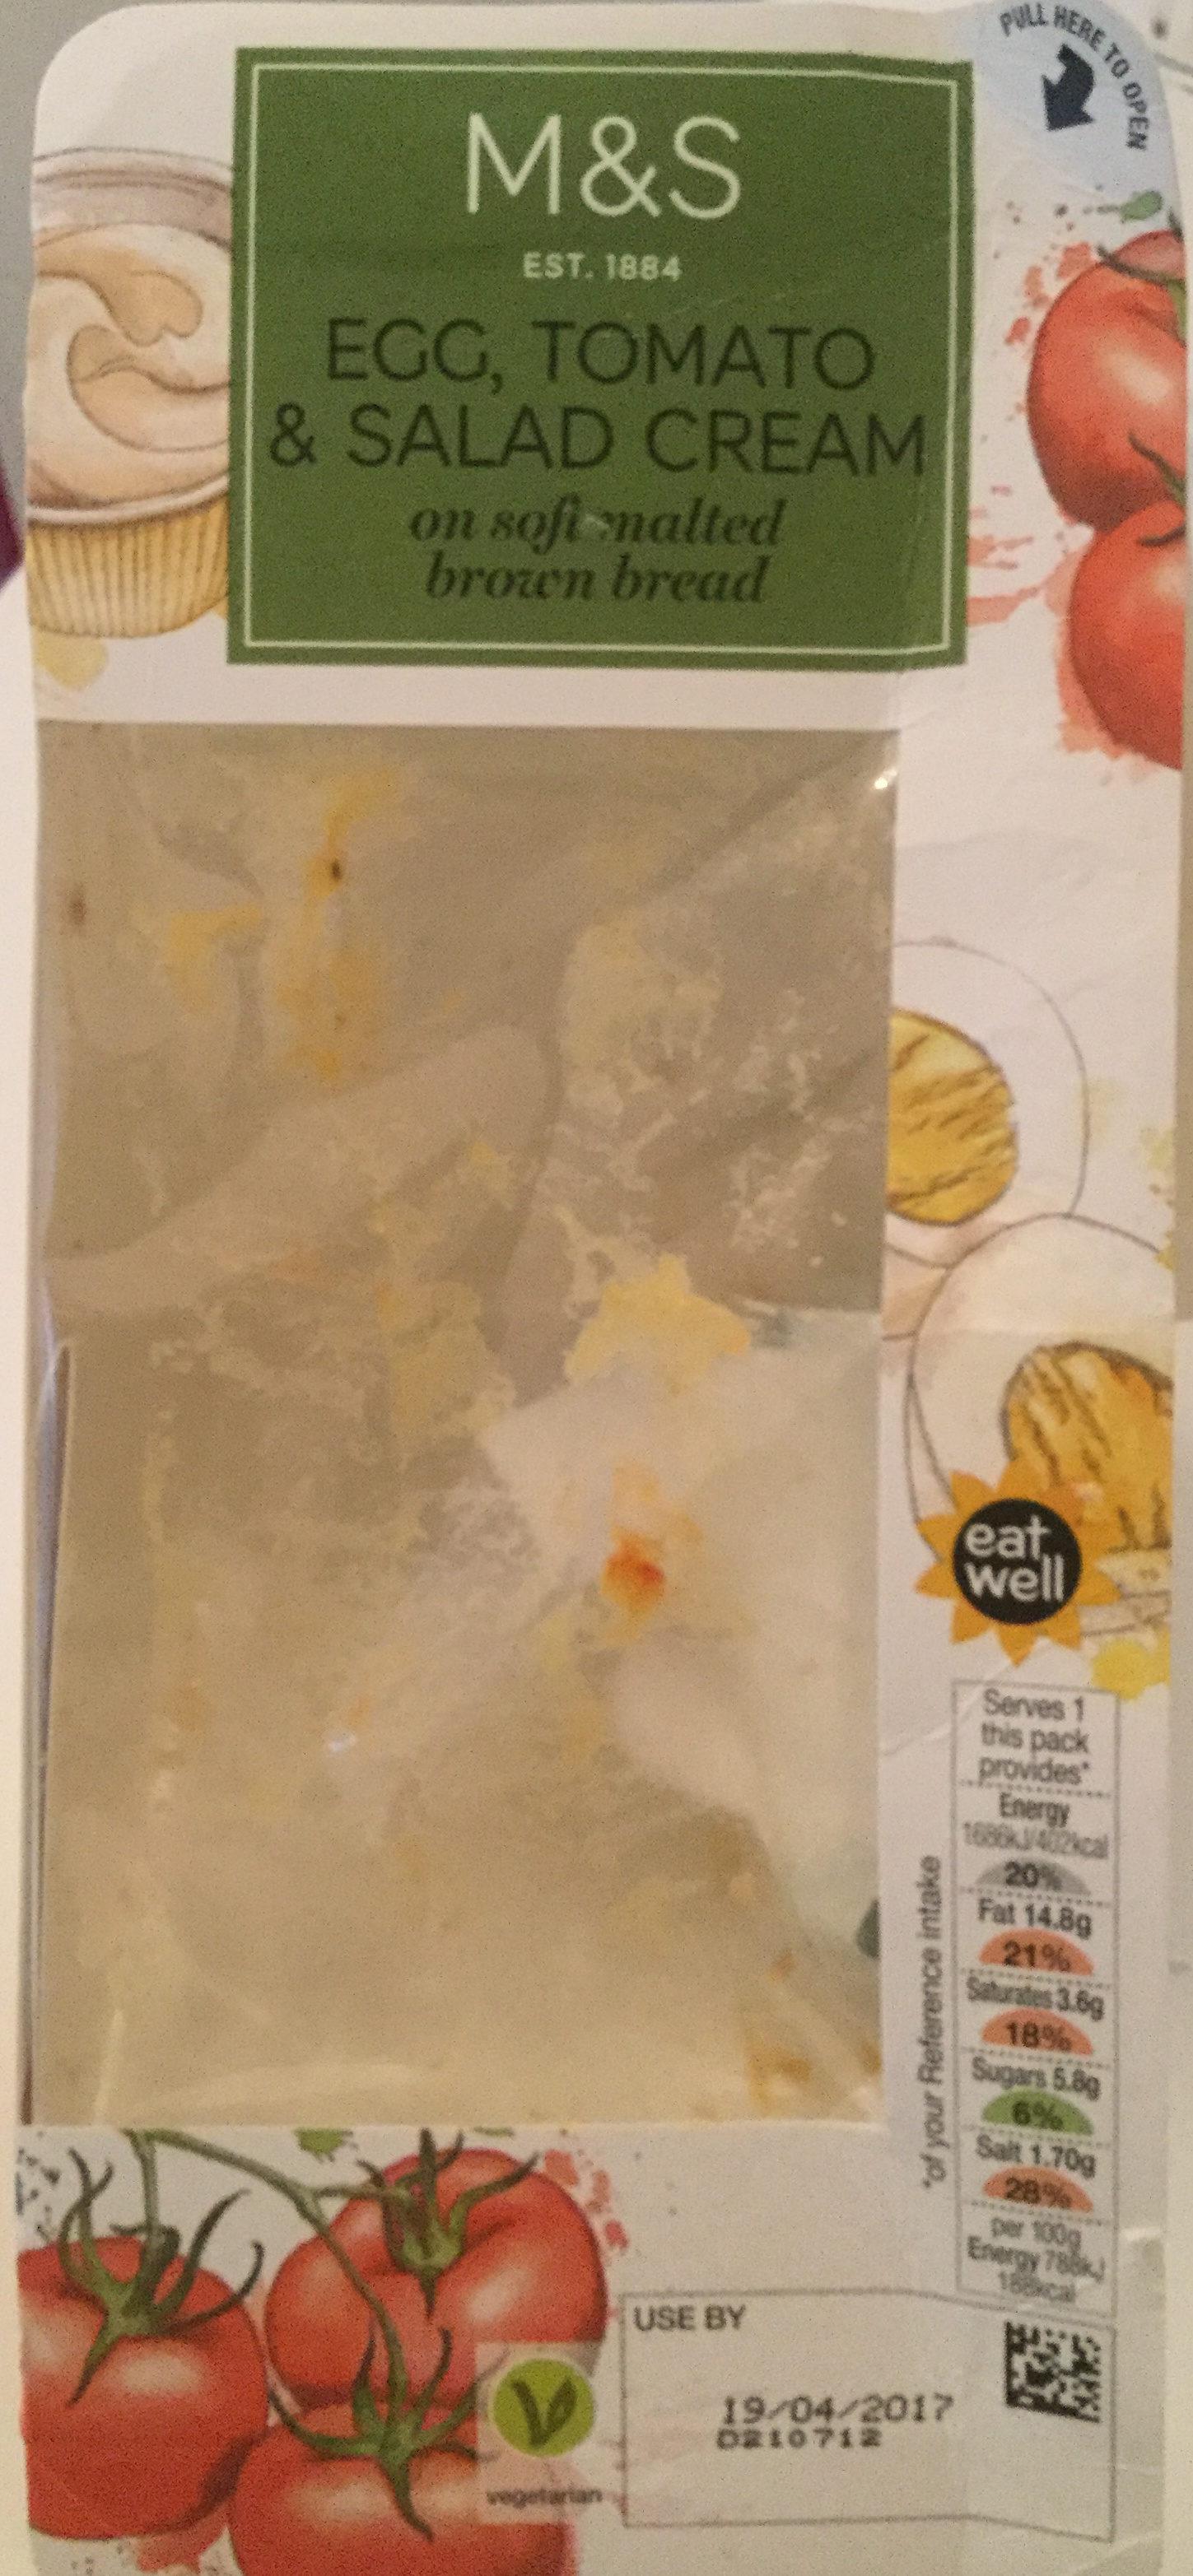 Egg, Tomato & Salad Cream - Product